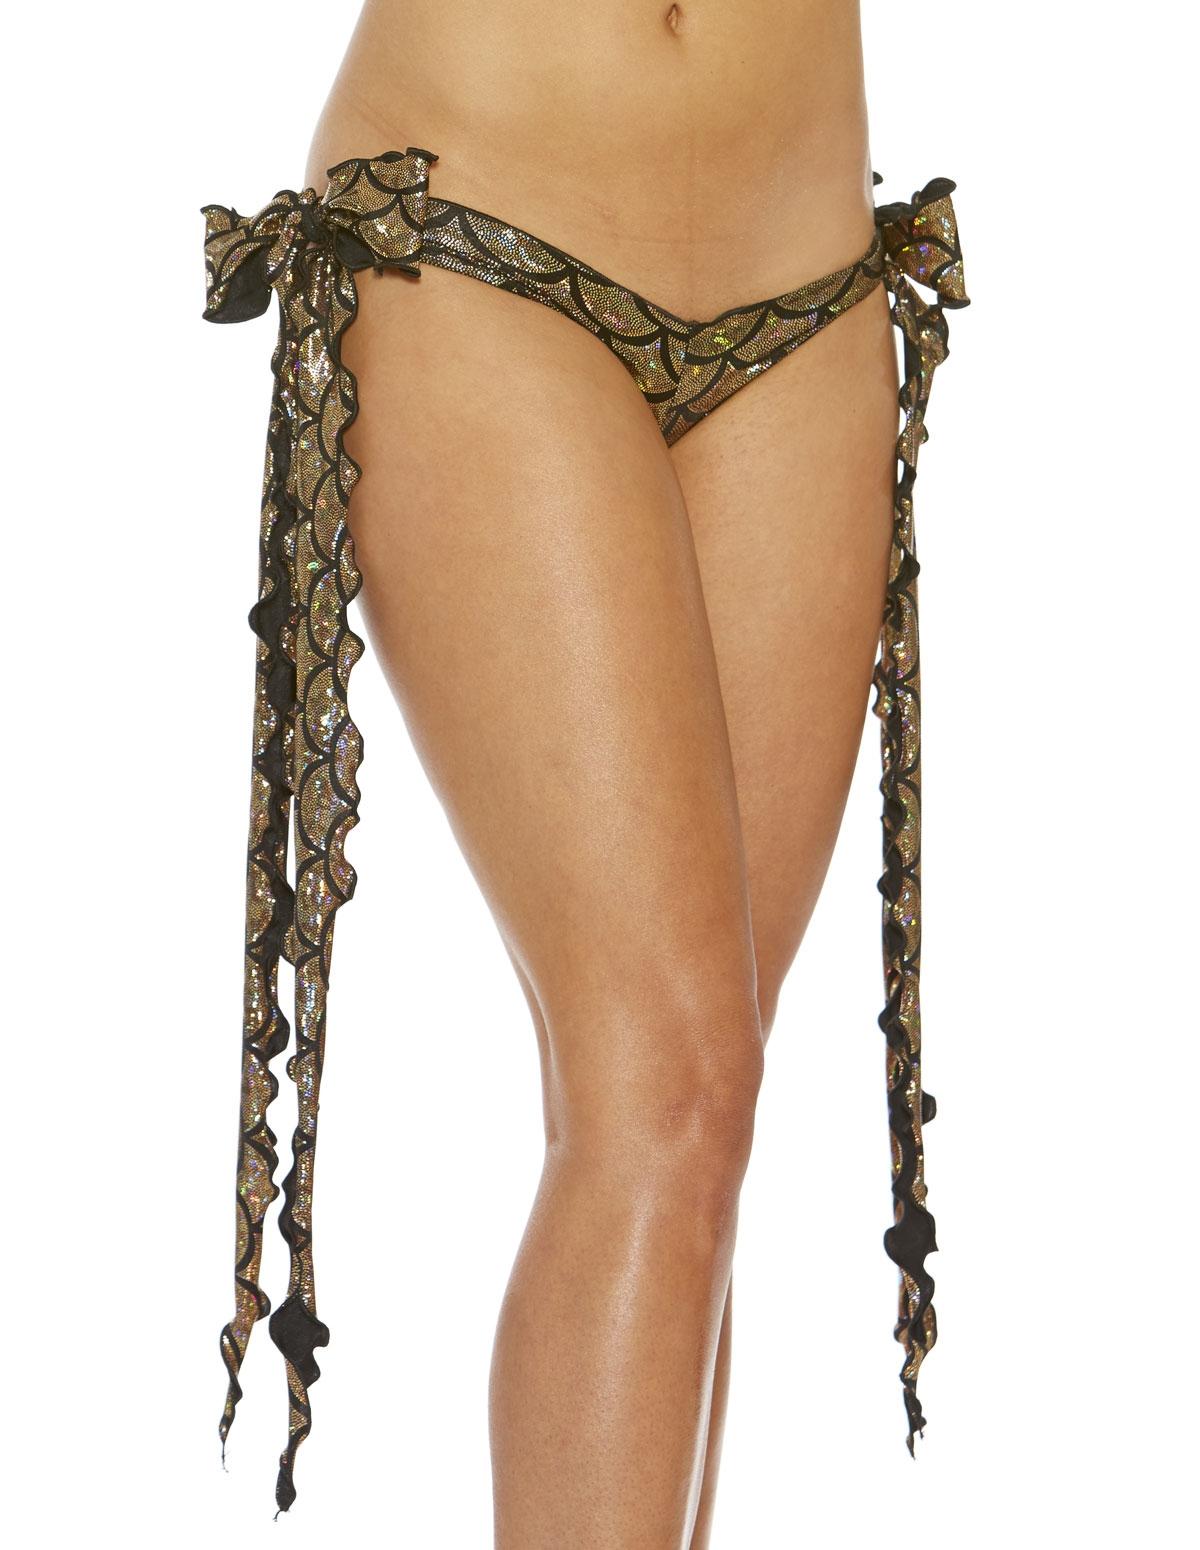 Mermaid Metallic Ribbon Tie Shorts